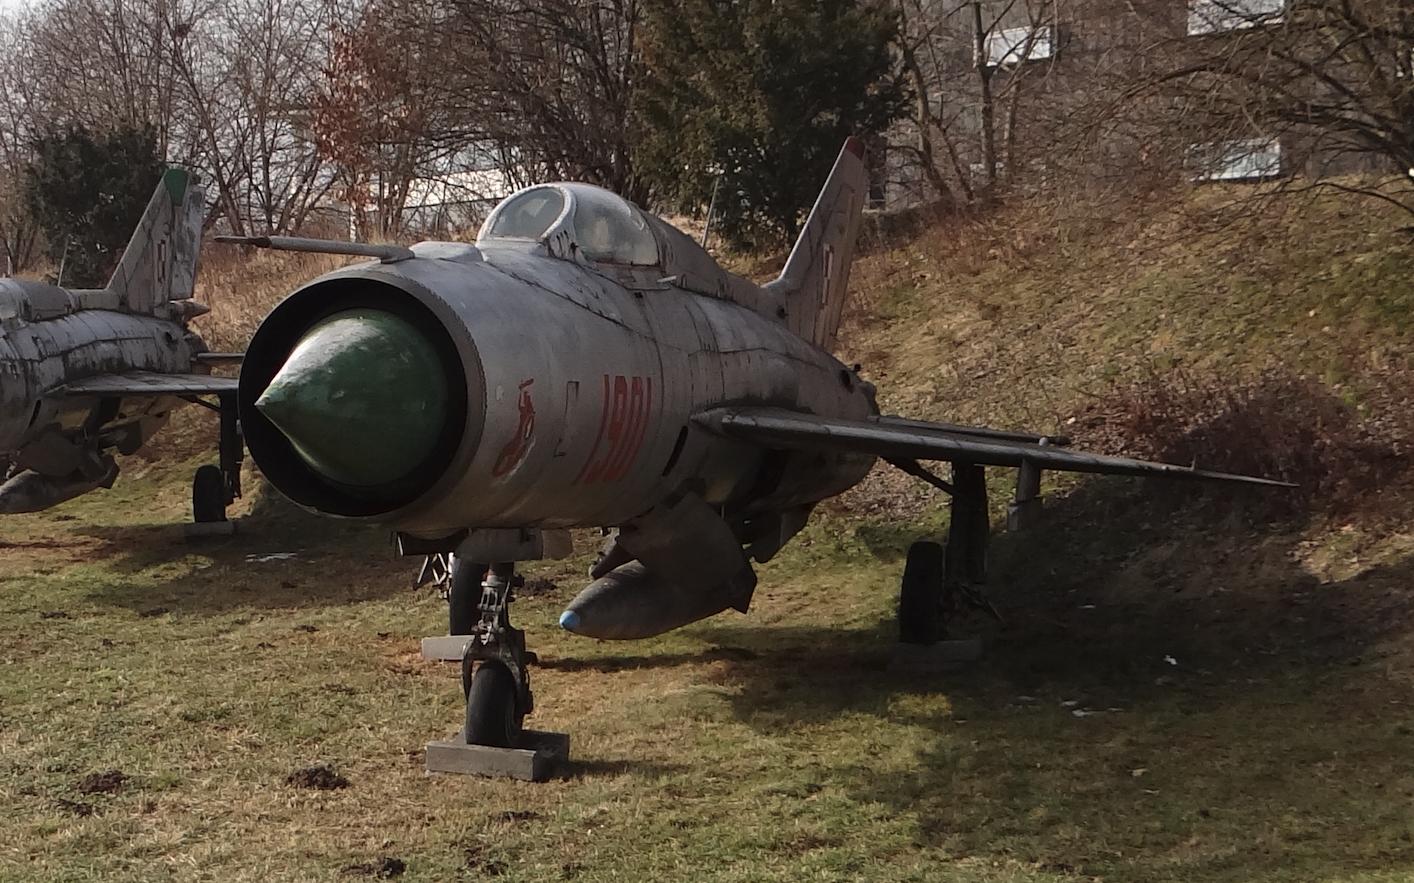 MiG-21 PF nb 1901. Kraków 2021 year. Photo by Karol Placha Hetman